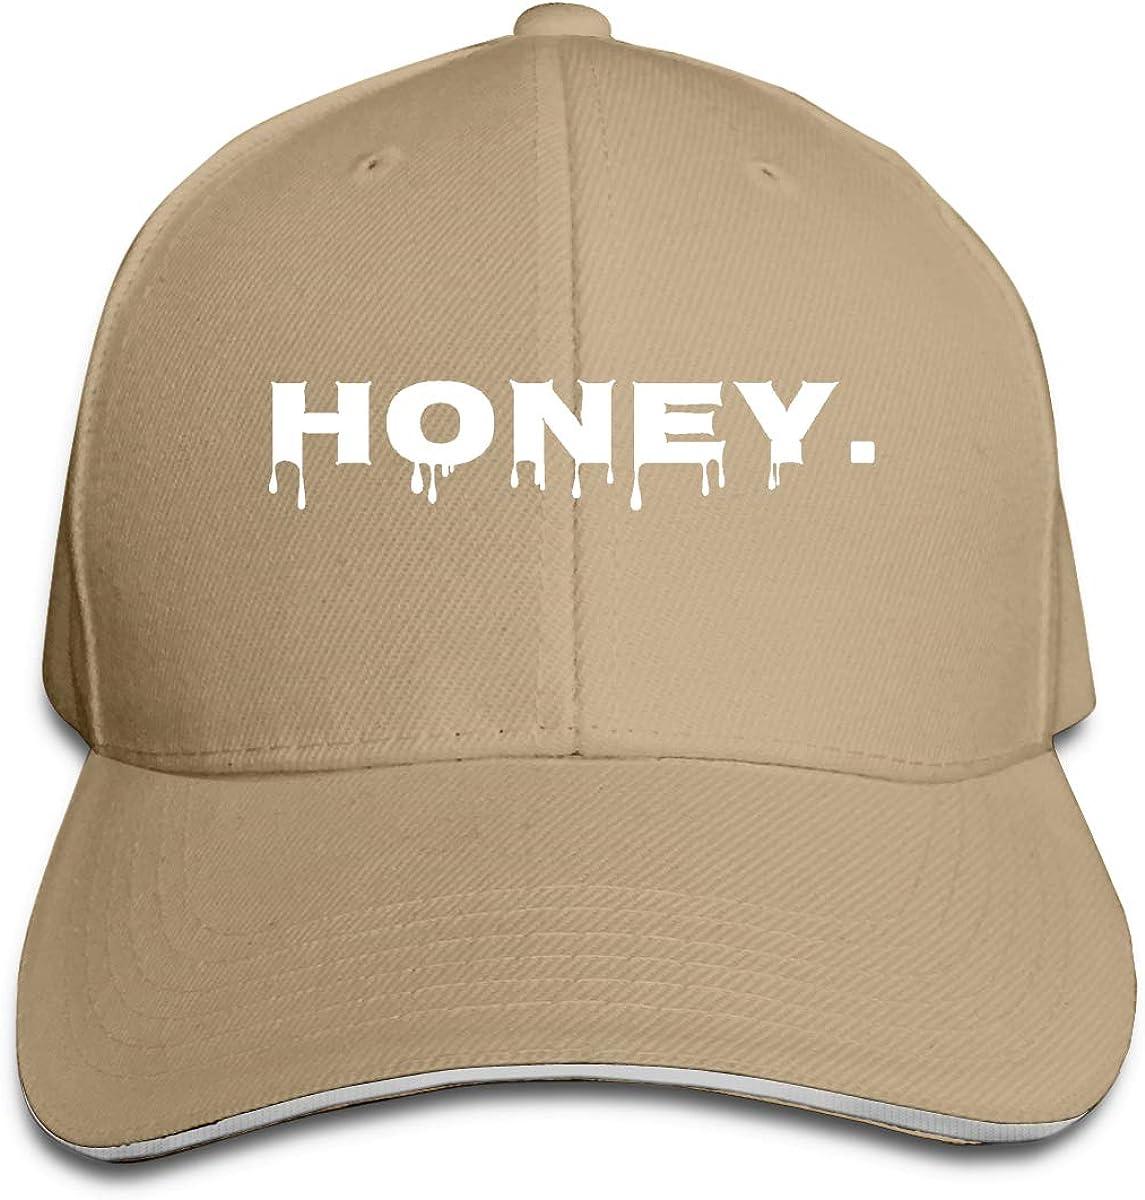 Honey Unisex Adult Baseball Caps Adjustable Sandwich Caps Jeans Caps Adjustable Denim Trucker Cap